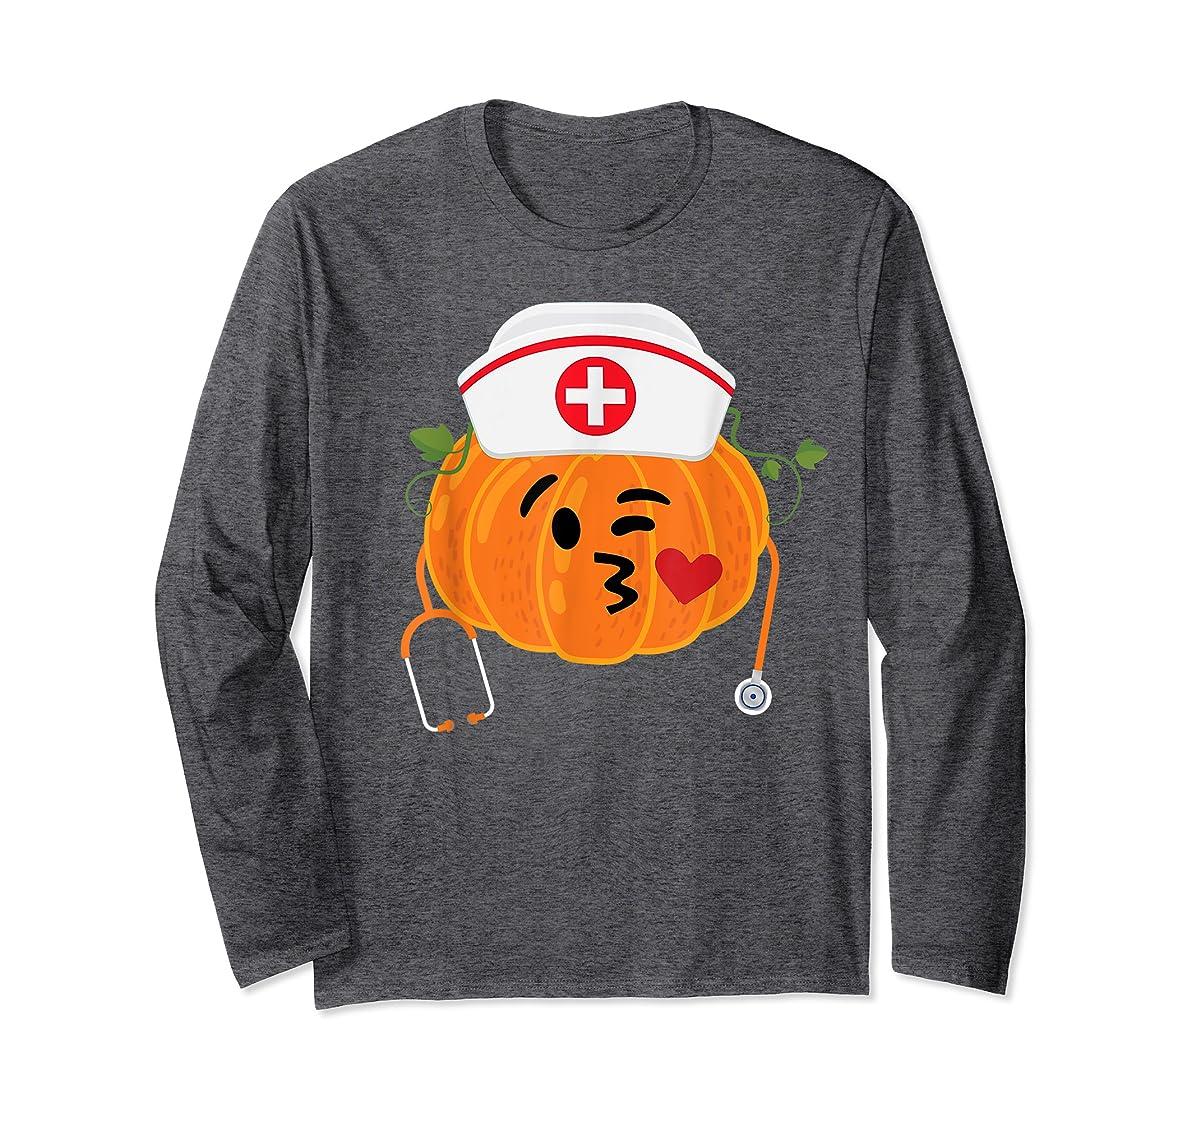 Nurse Stethoscope Pumpkin Funny Nursing Halloween Gift T-Shirt-Long Sleeve-Dark Heather